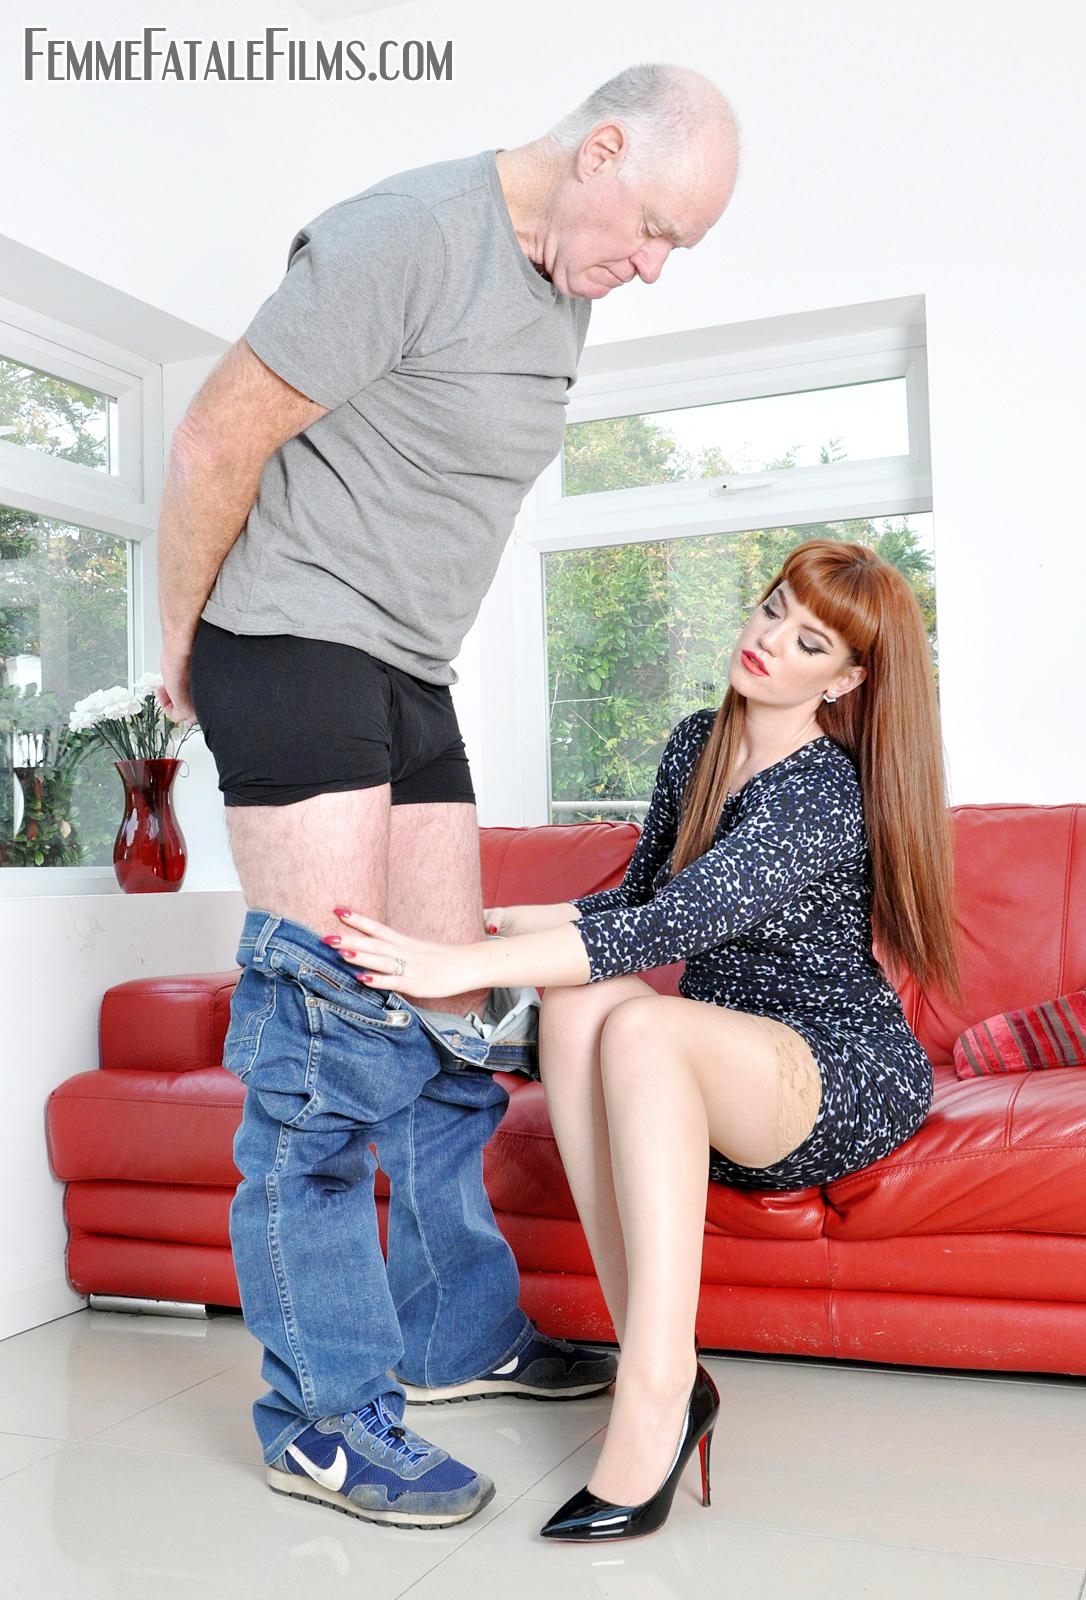 Miss Zoe prepares to administer a sound bare bottom spanking punishment